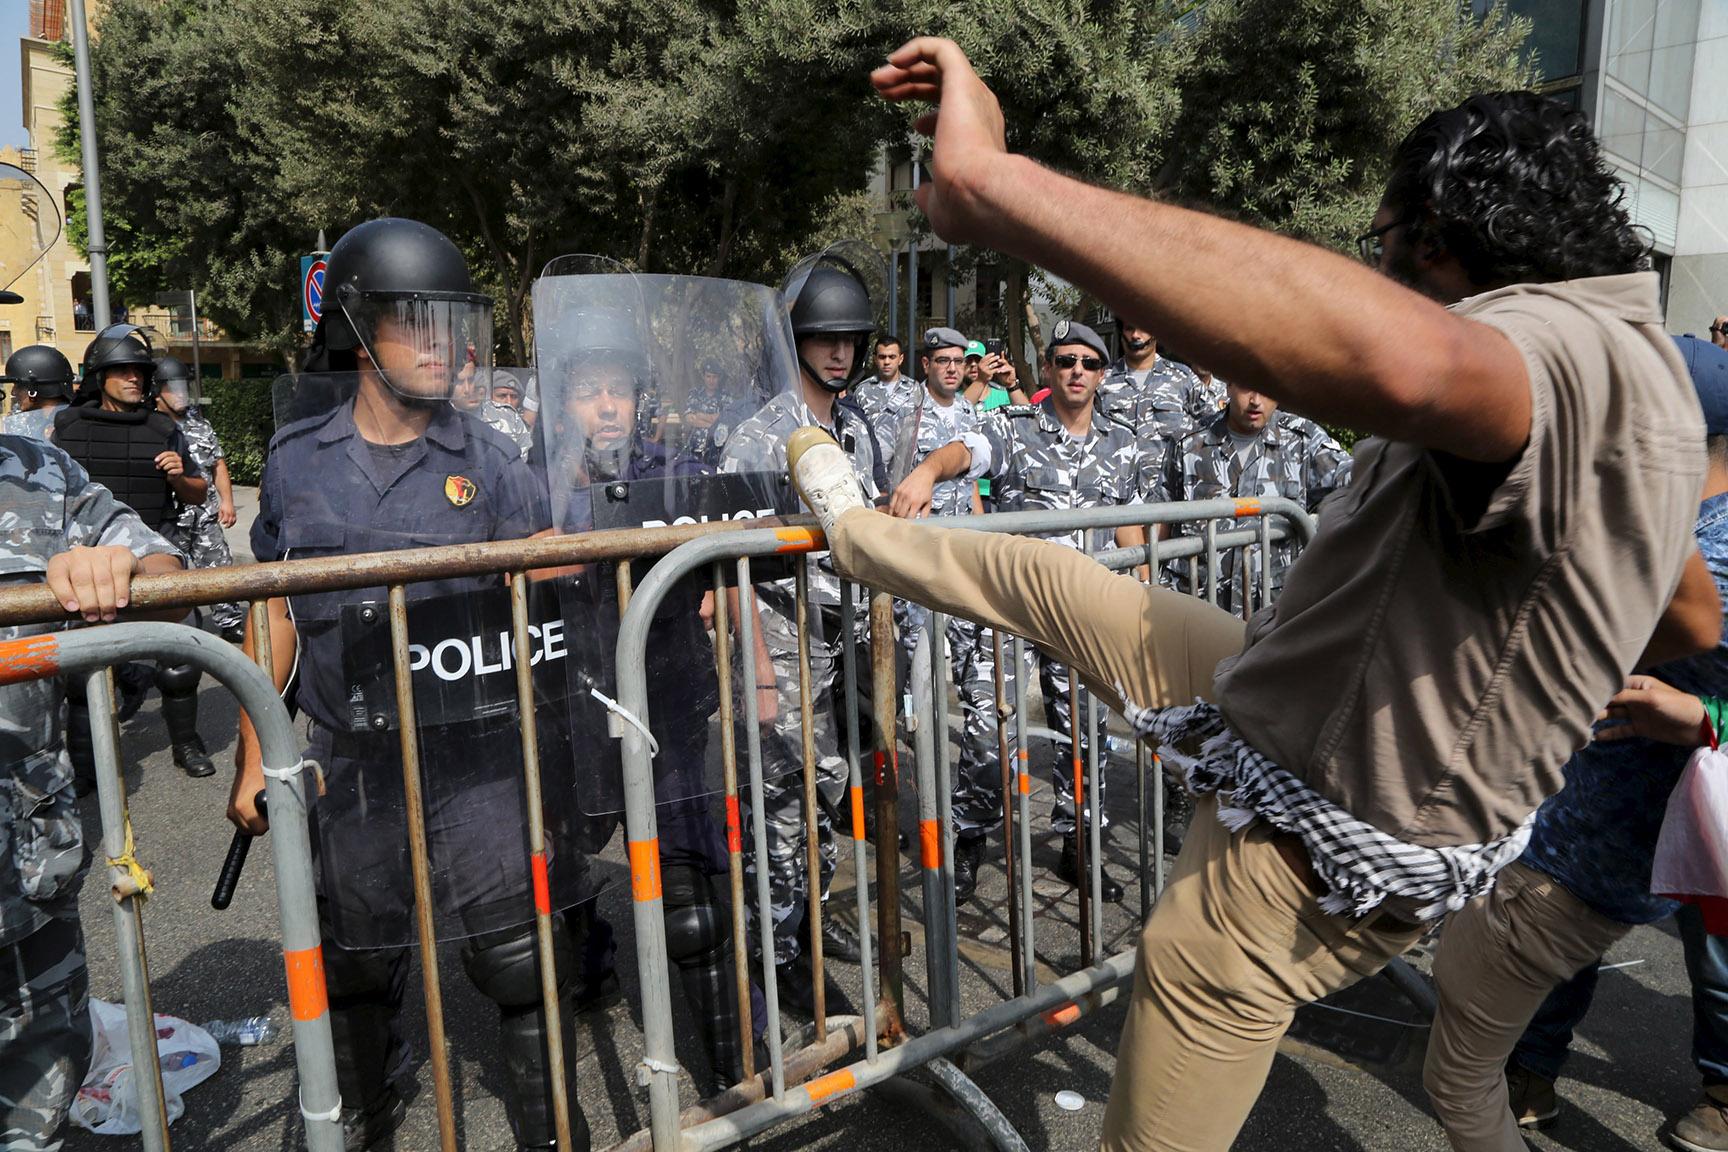 A protester kicks a barrier near riot police in downtown Beirut, Lebanon